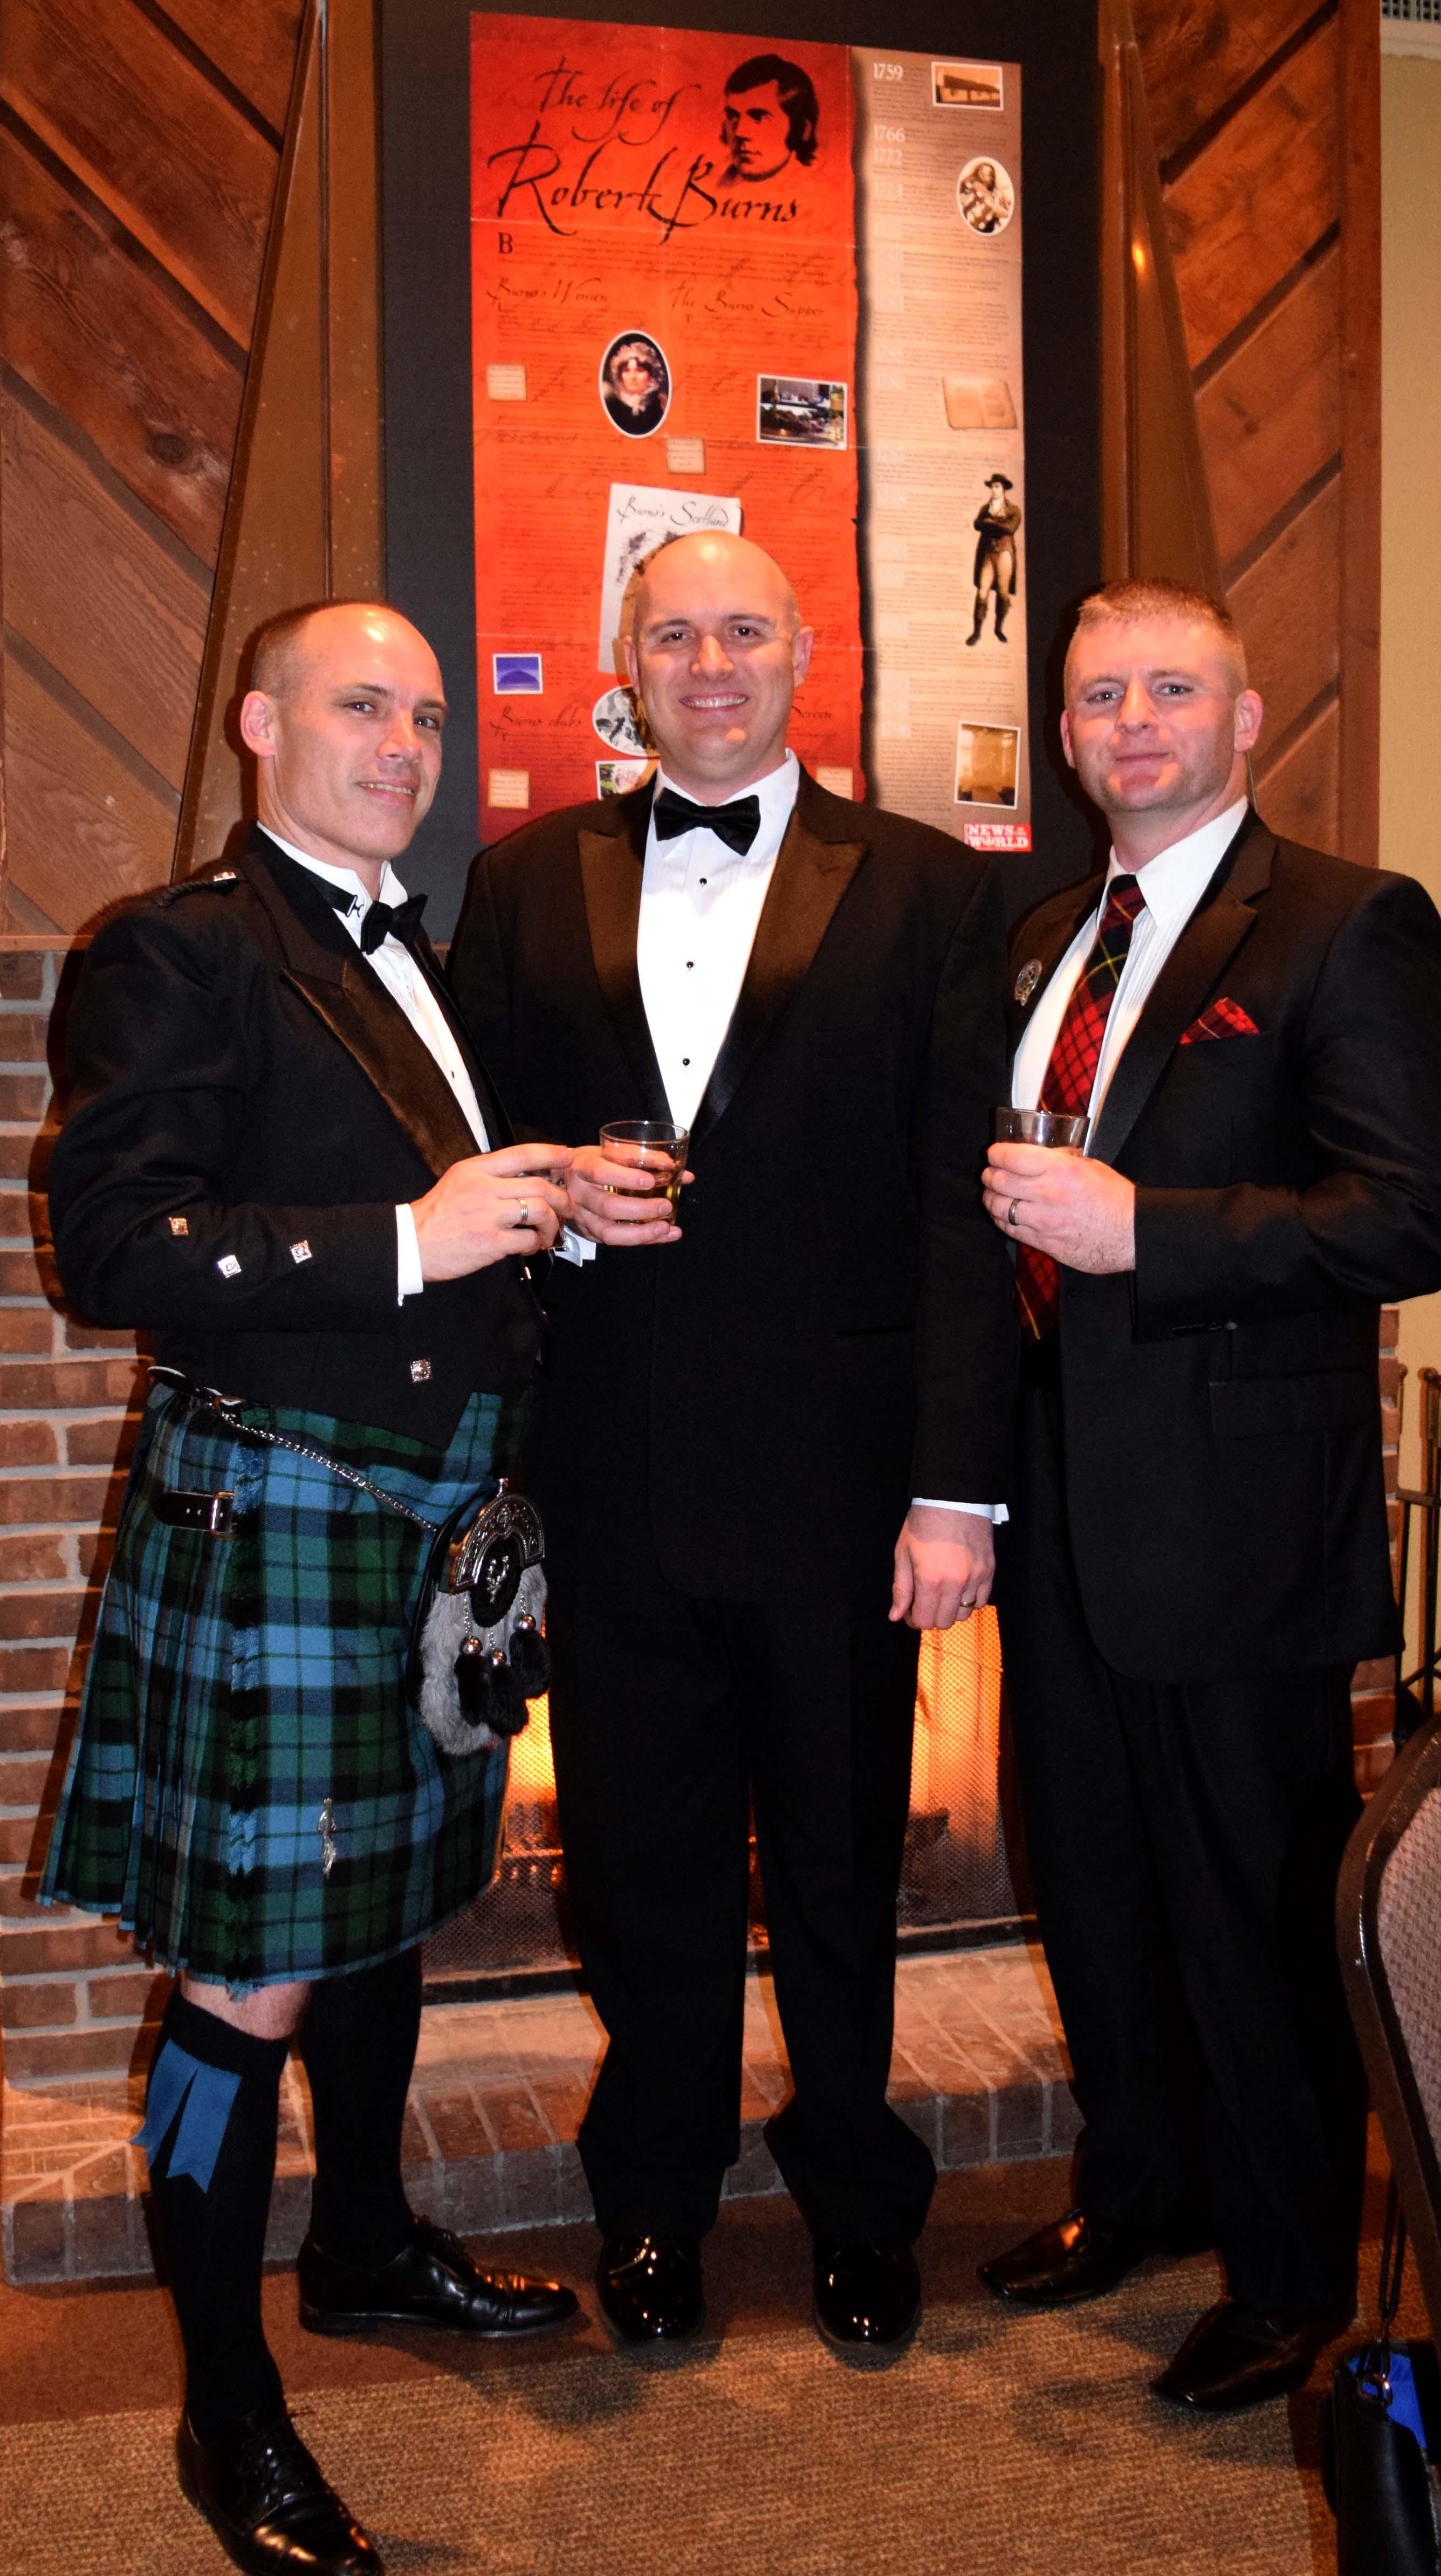 Glen Shilland, Tom Morgan & Brandon McSwain